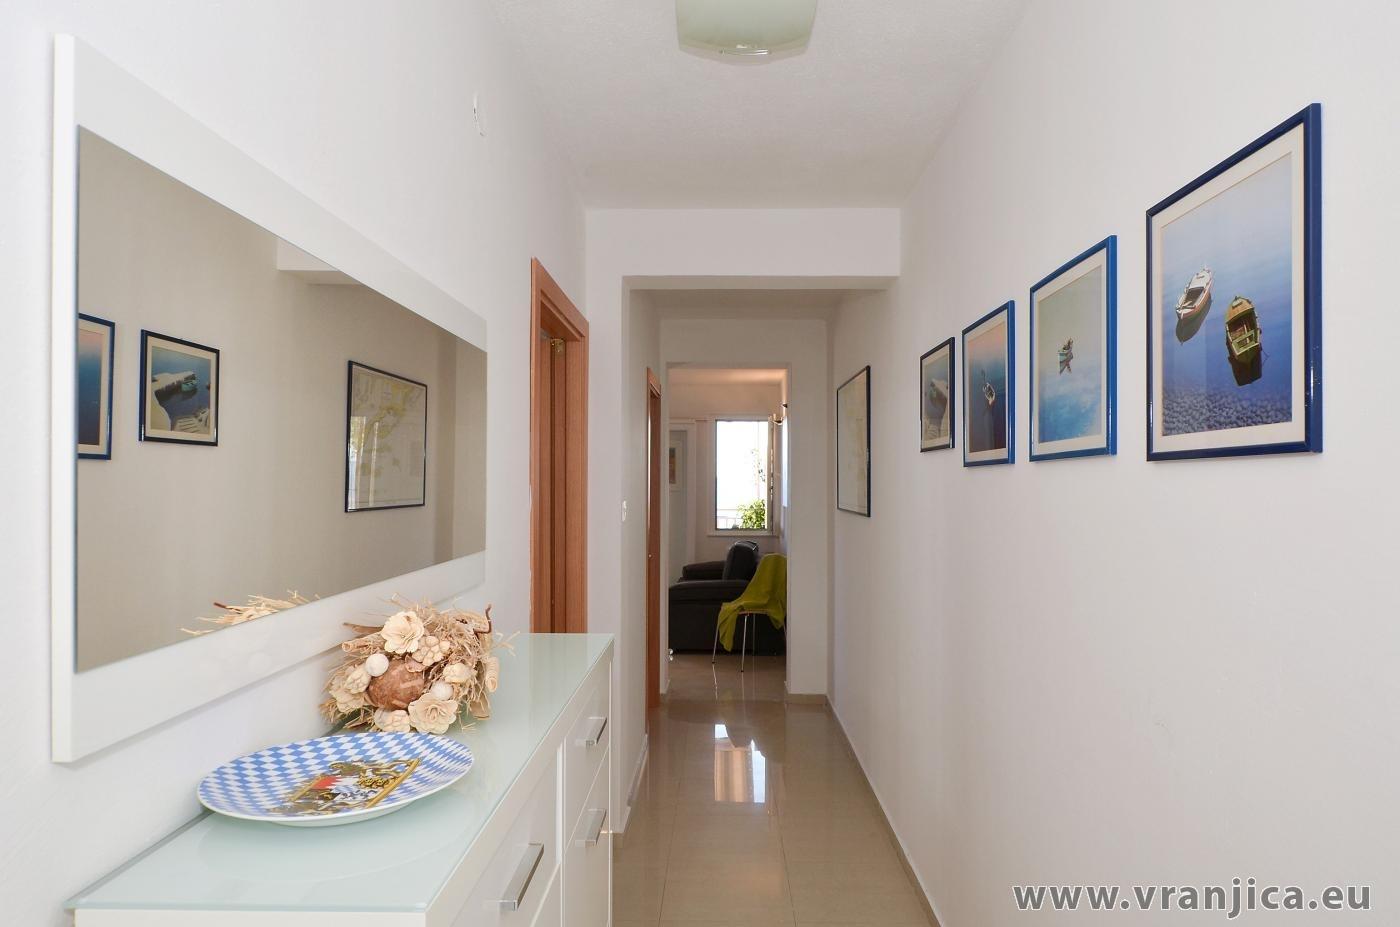 https://www.vranjica.eu/pokoje/apartman-inge-ap2-4-1-1572992307L.jpg